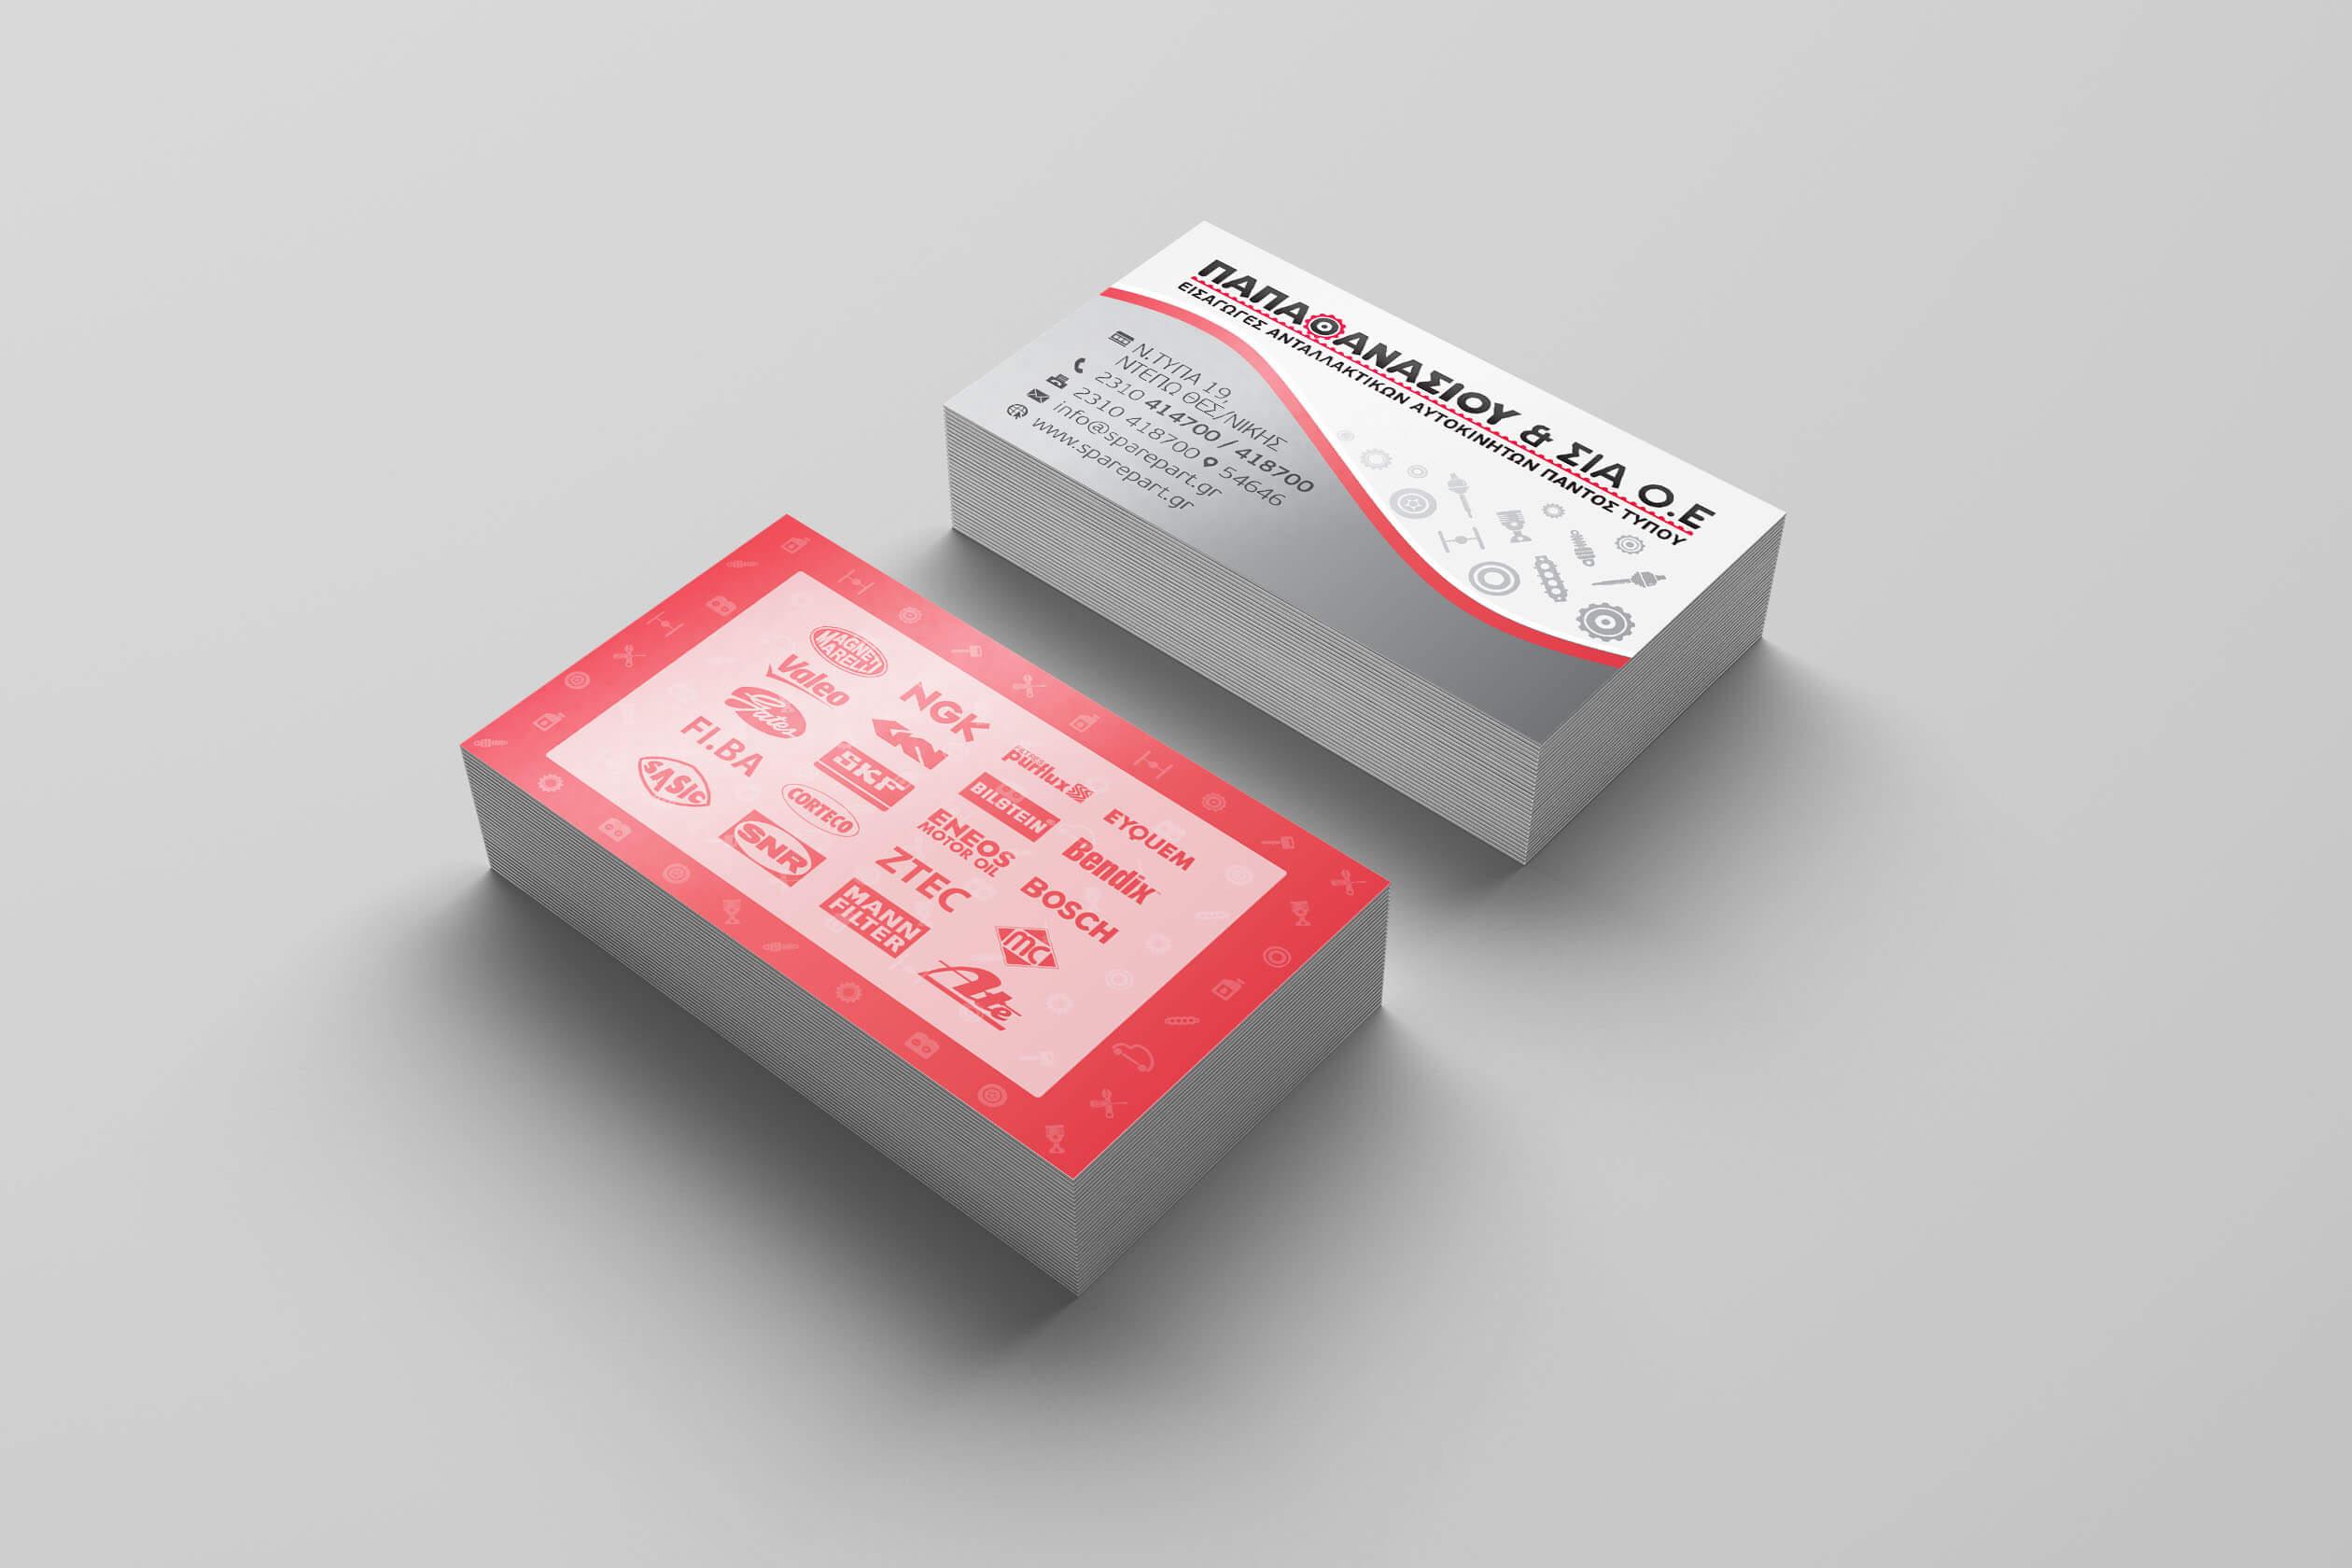 papathanasiou card